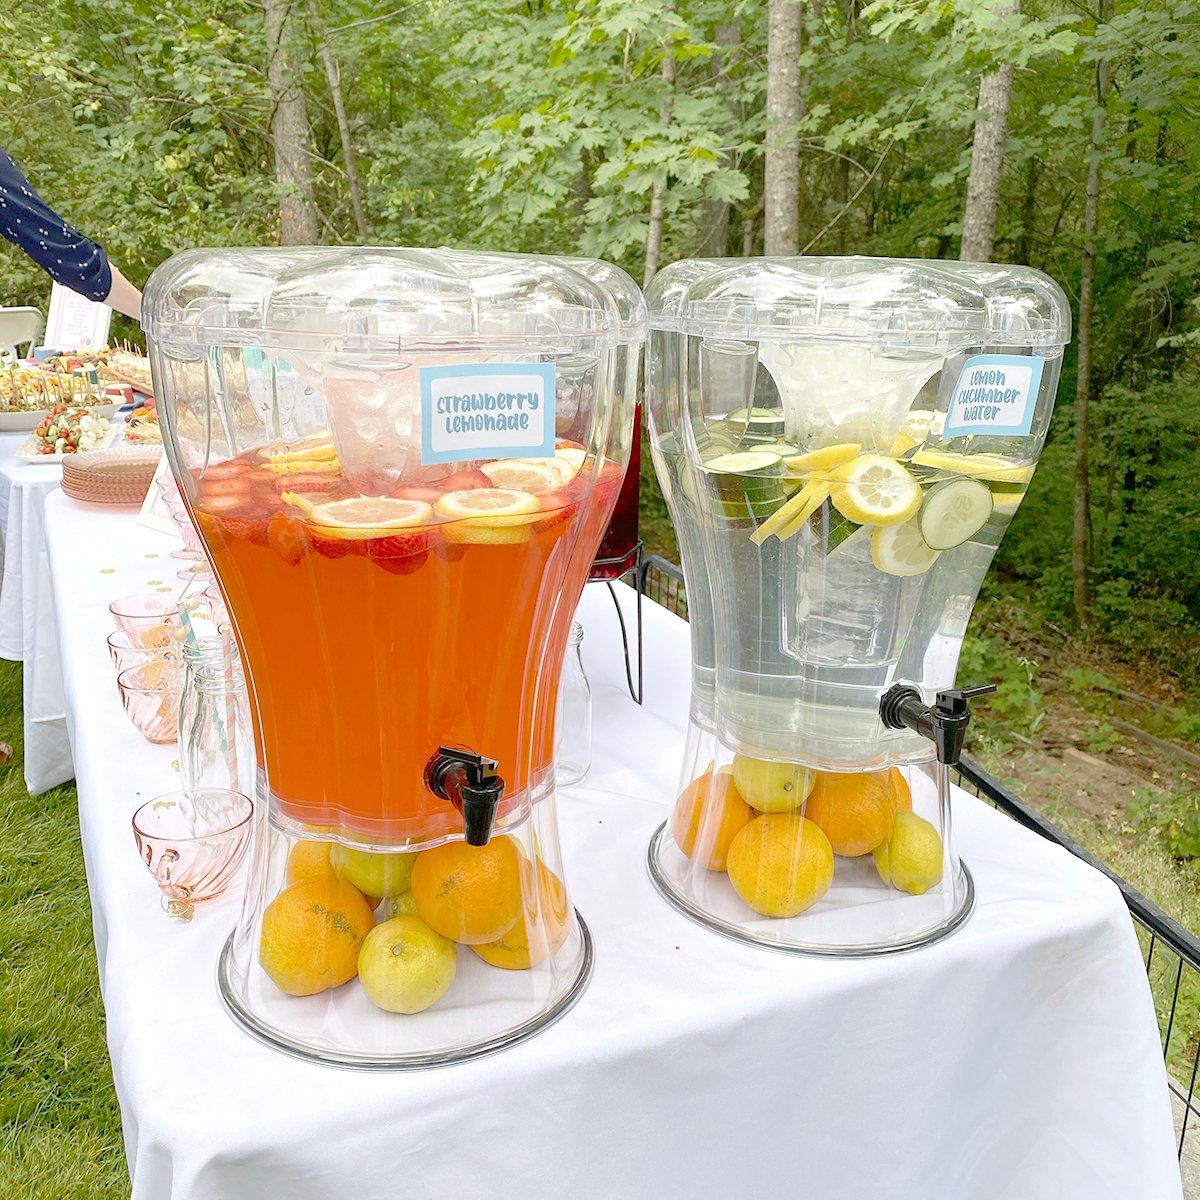 strawberry lemonade and cucumber lemon water